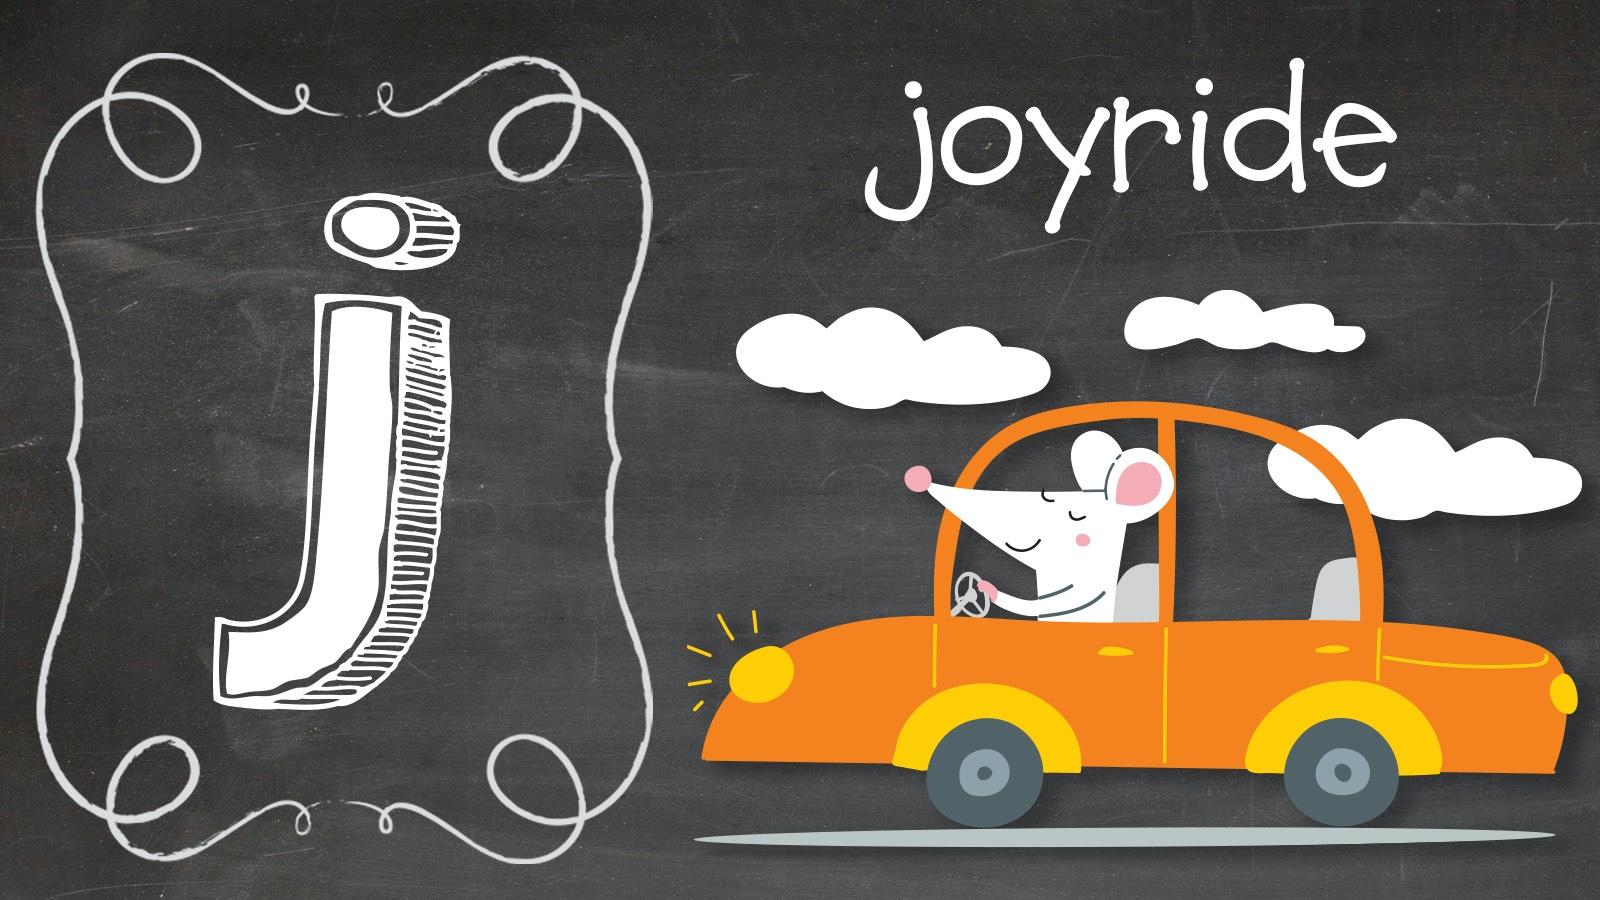 Positive J word Joyride mouse in car